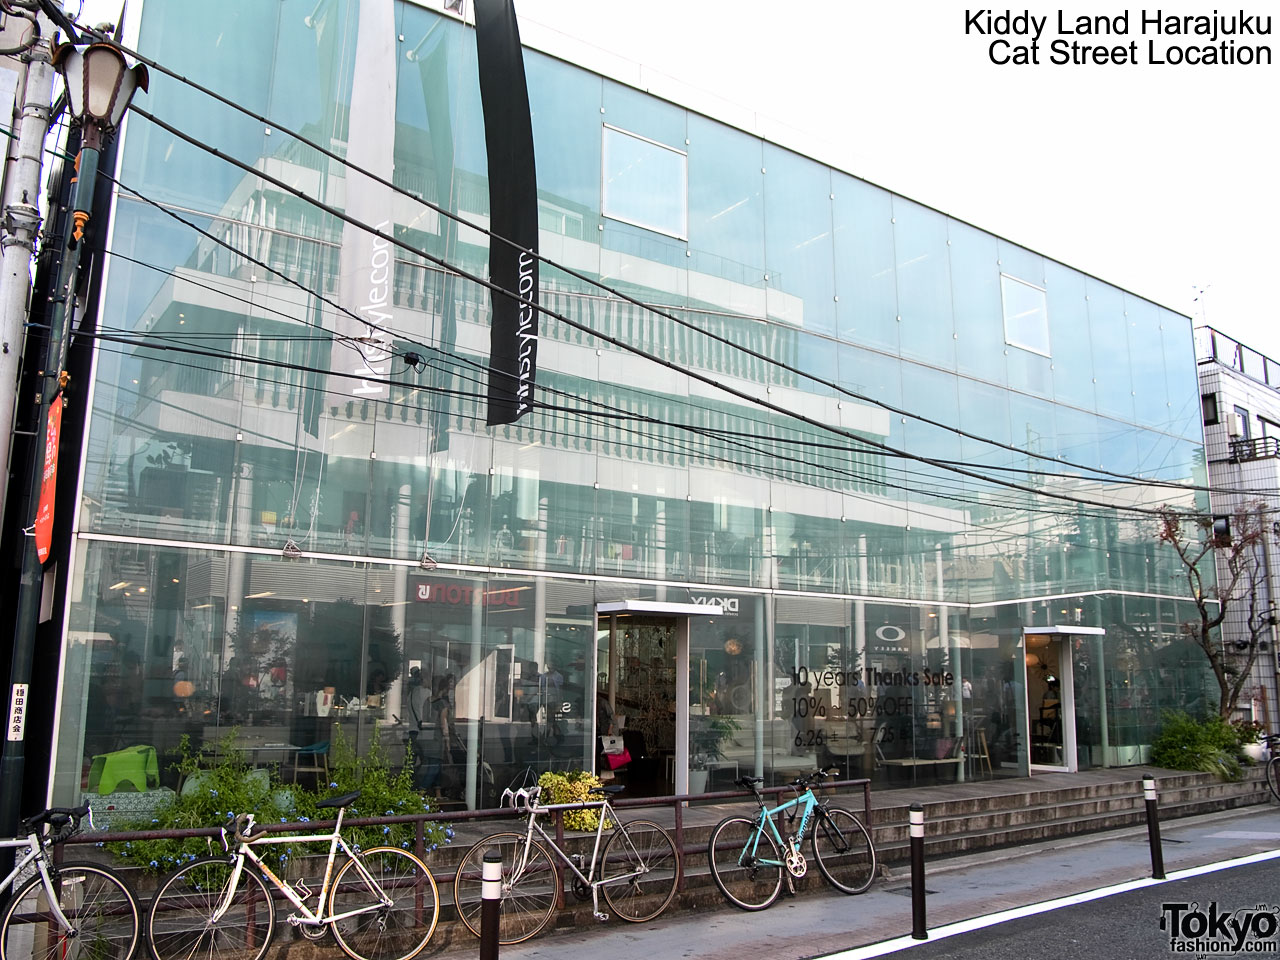 Kiddyland Tokyo Harajuku